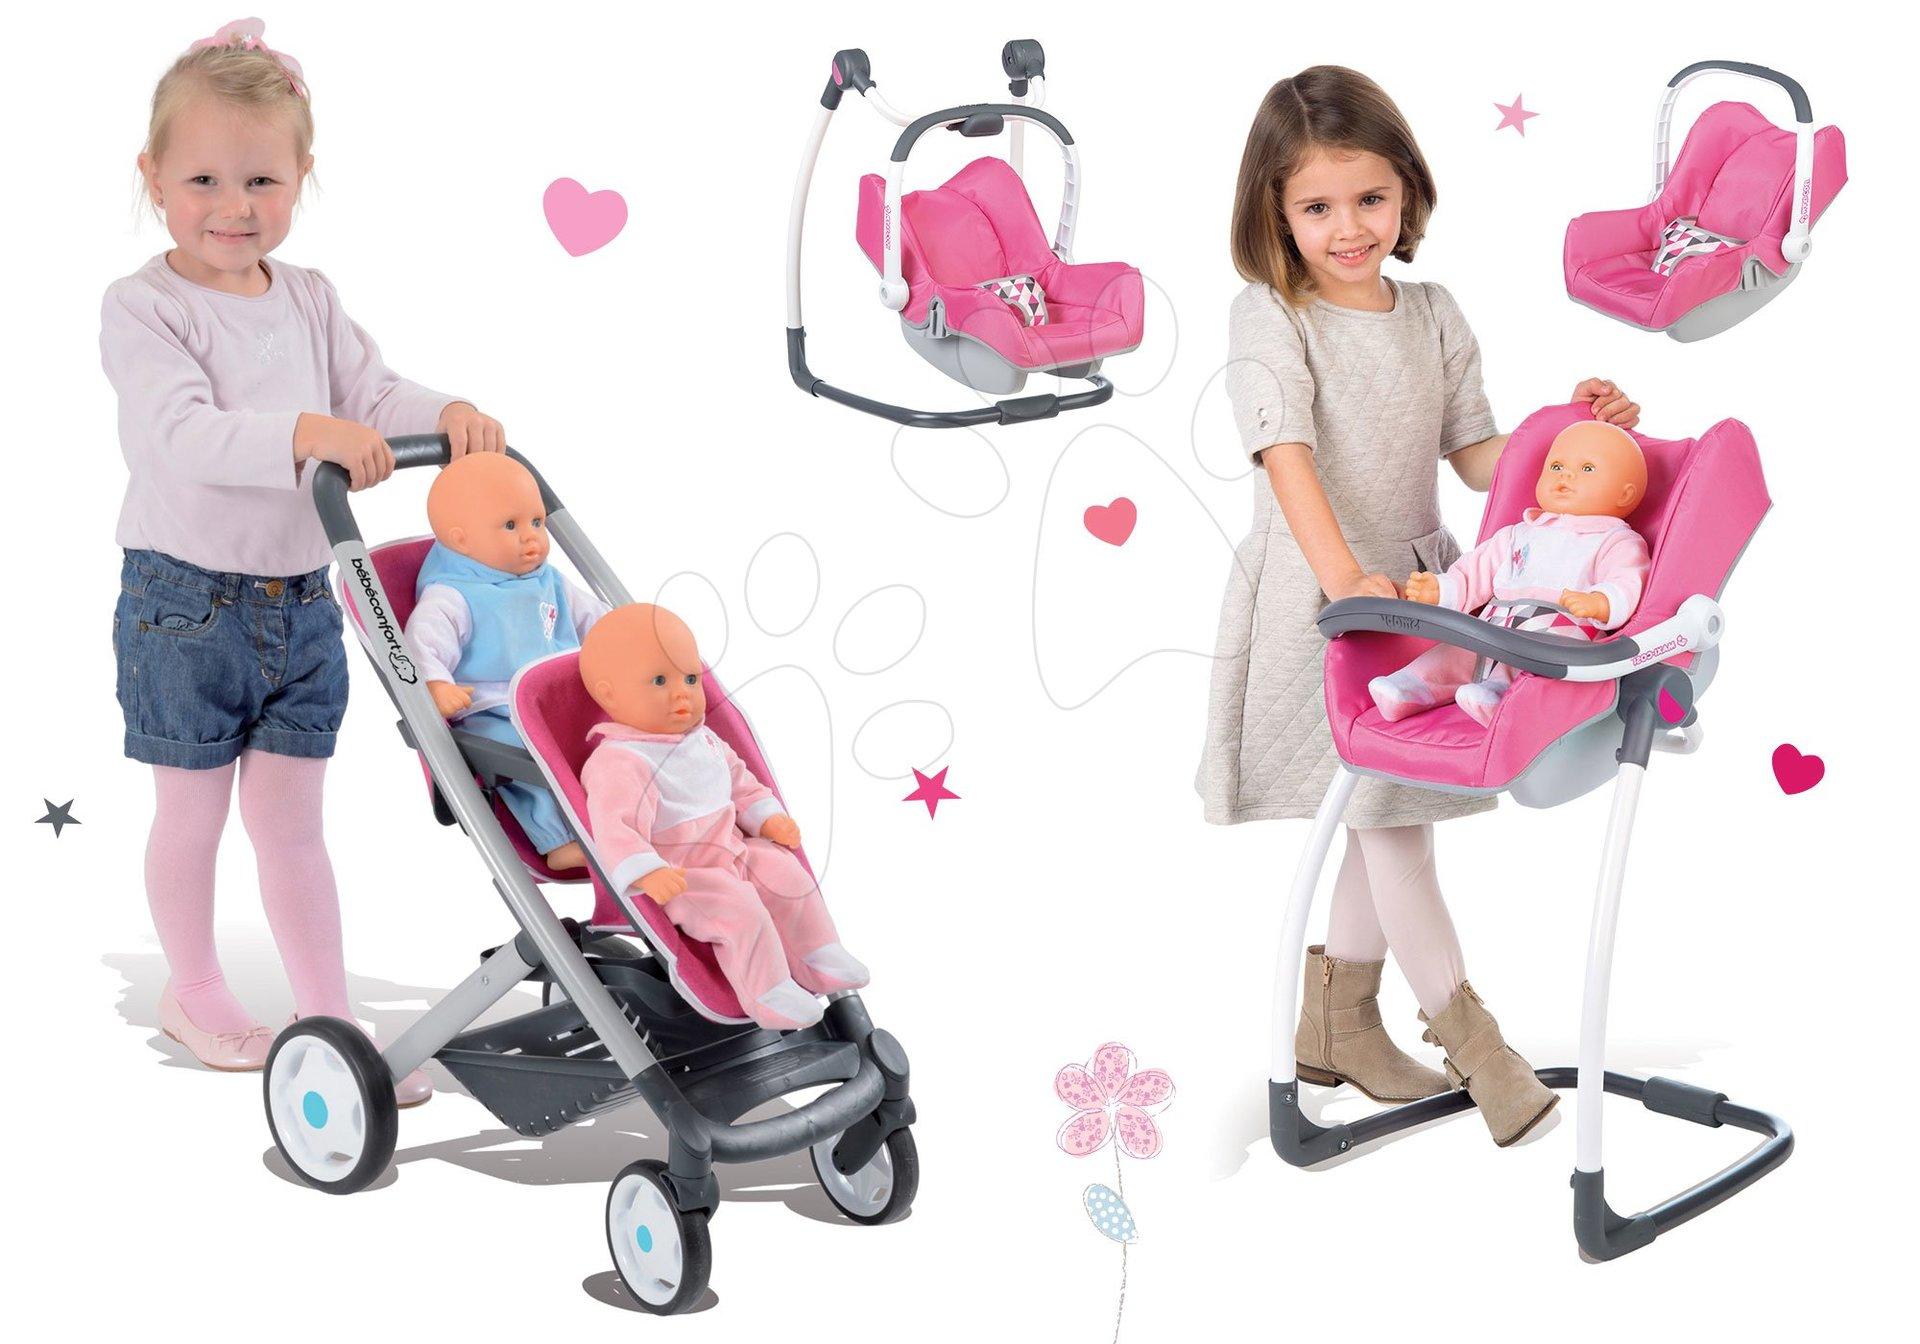 Smoby dětský kočárek Maxi Cosi & Quinny pro 2 panenky a autosedačka 3v1 521590-2